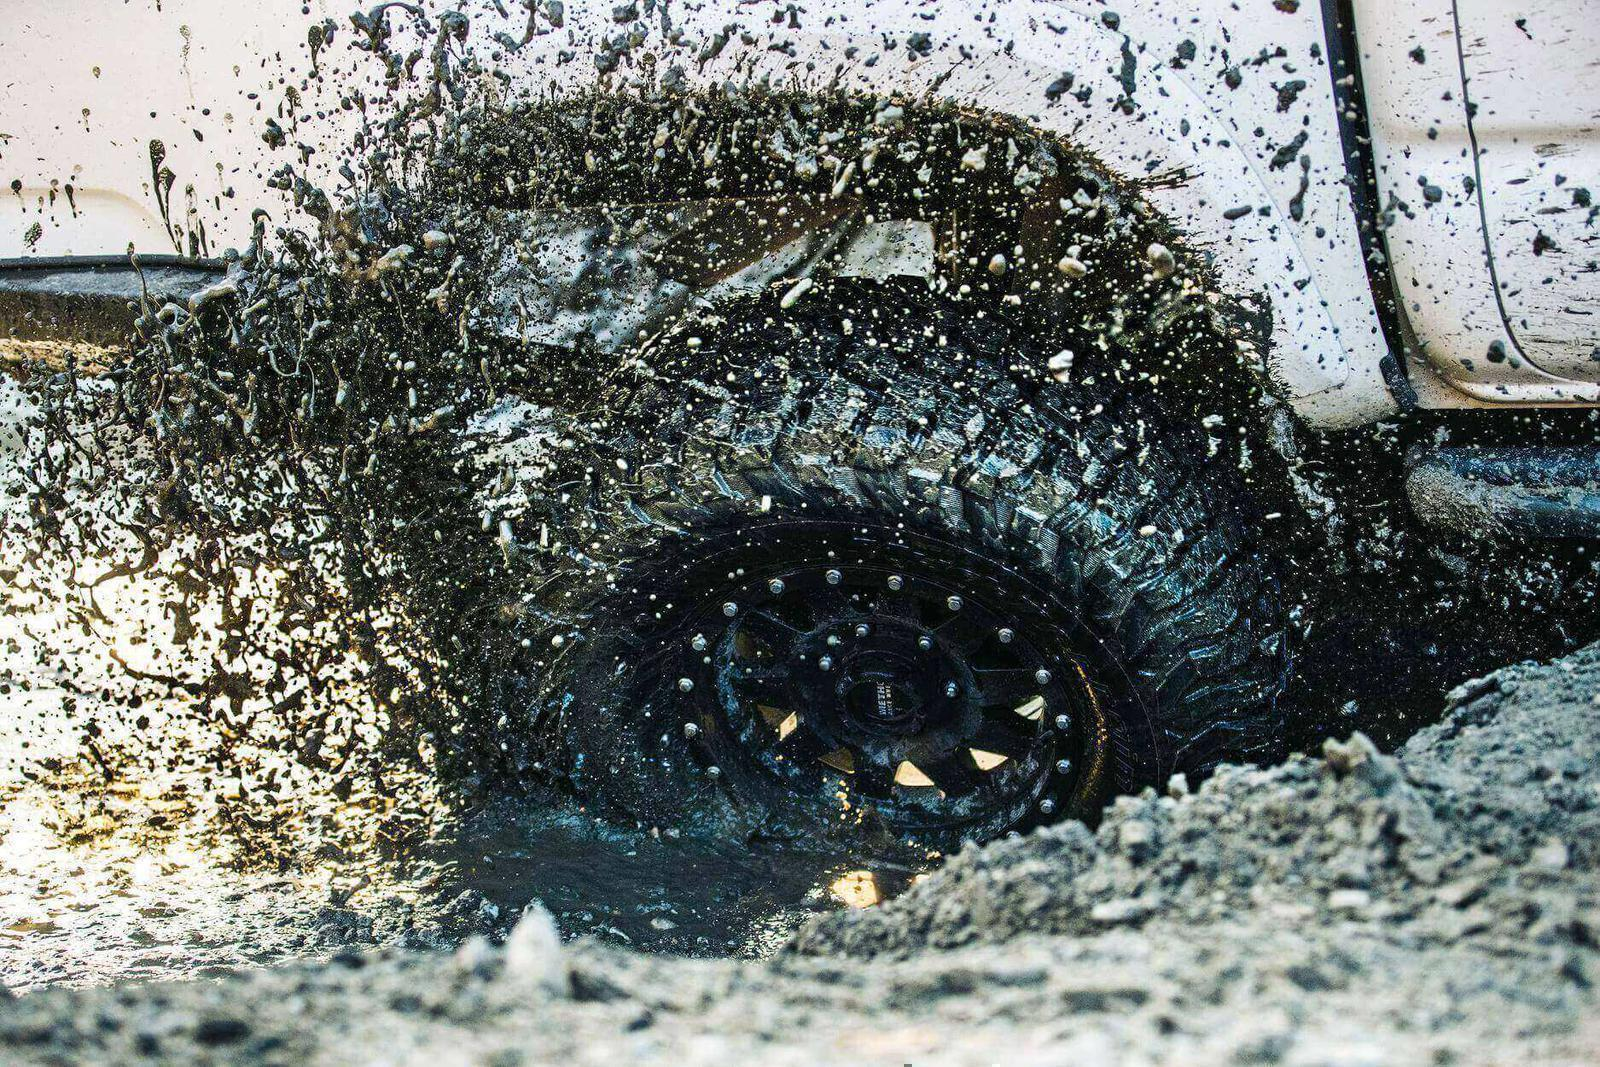 BF Goodrich Tires in Greenville, SC